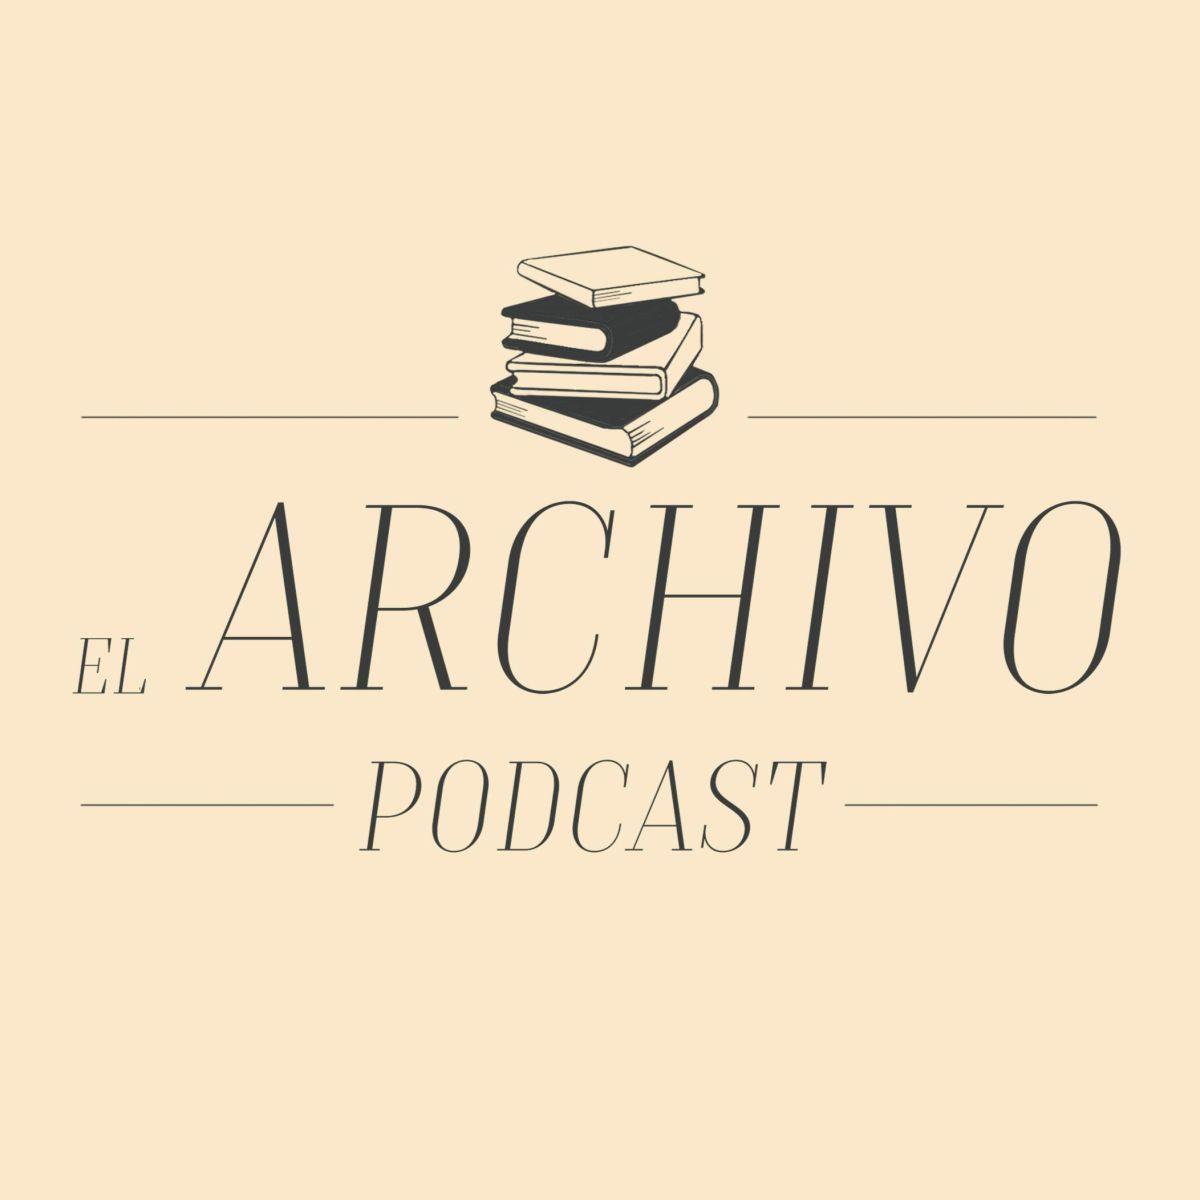 El Archivo Podcast